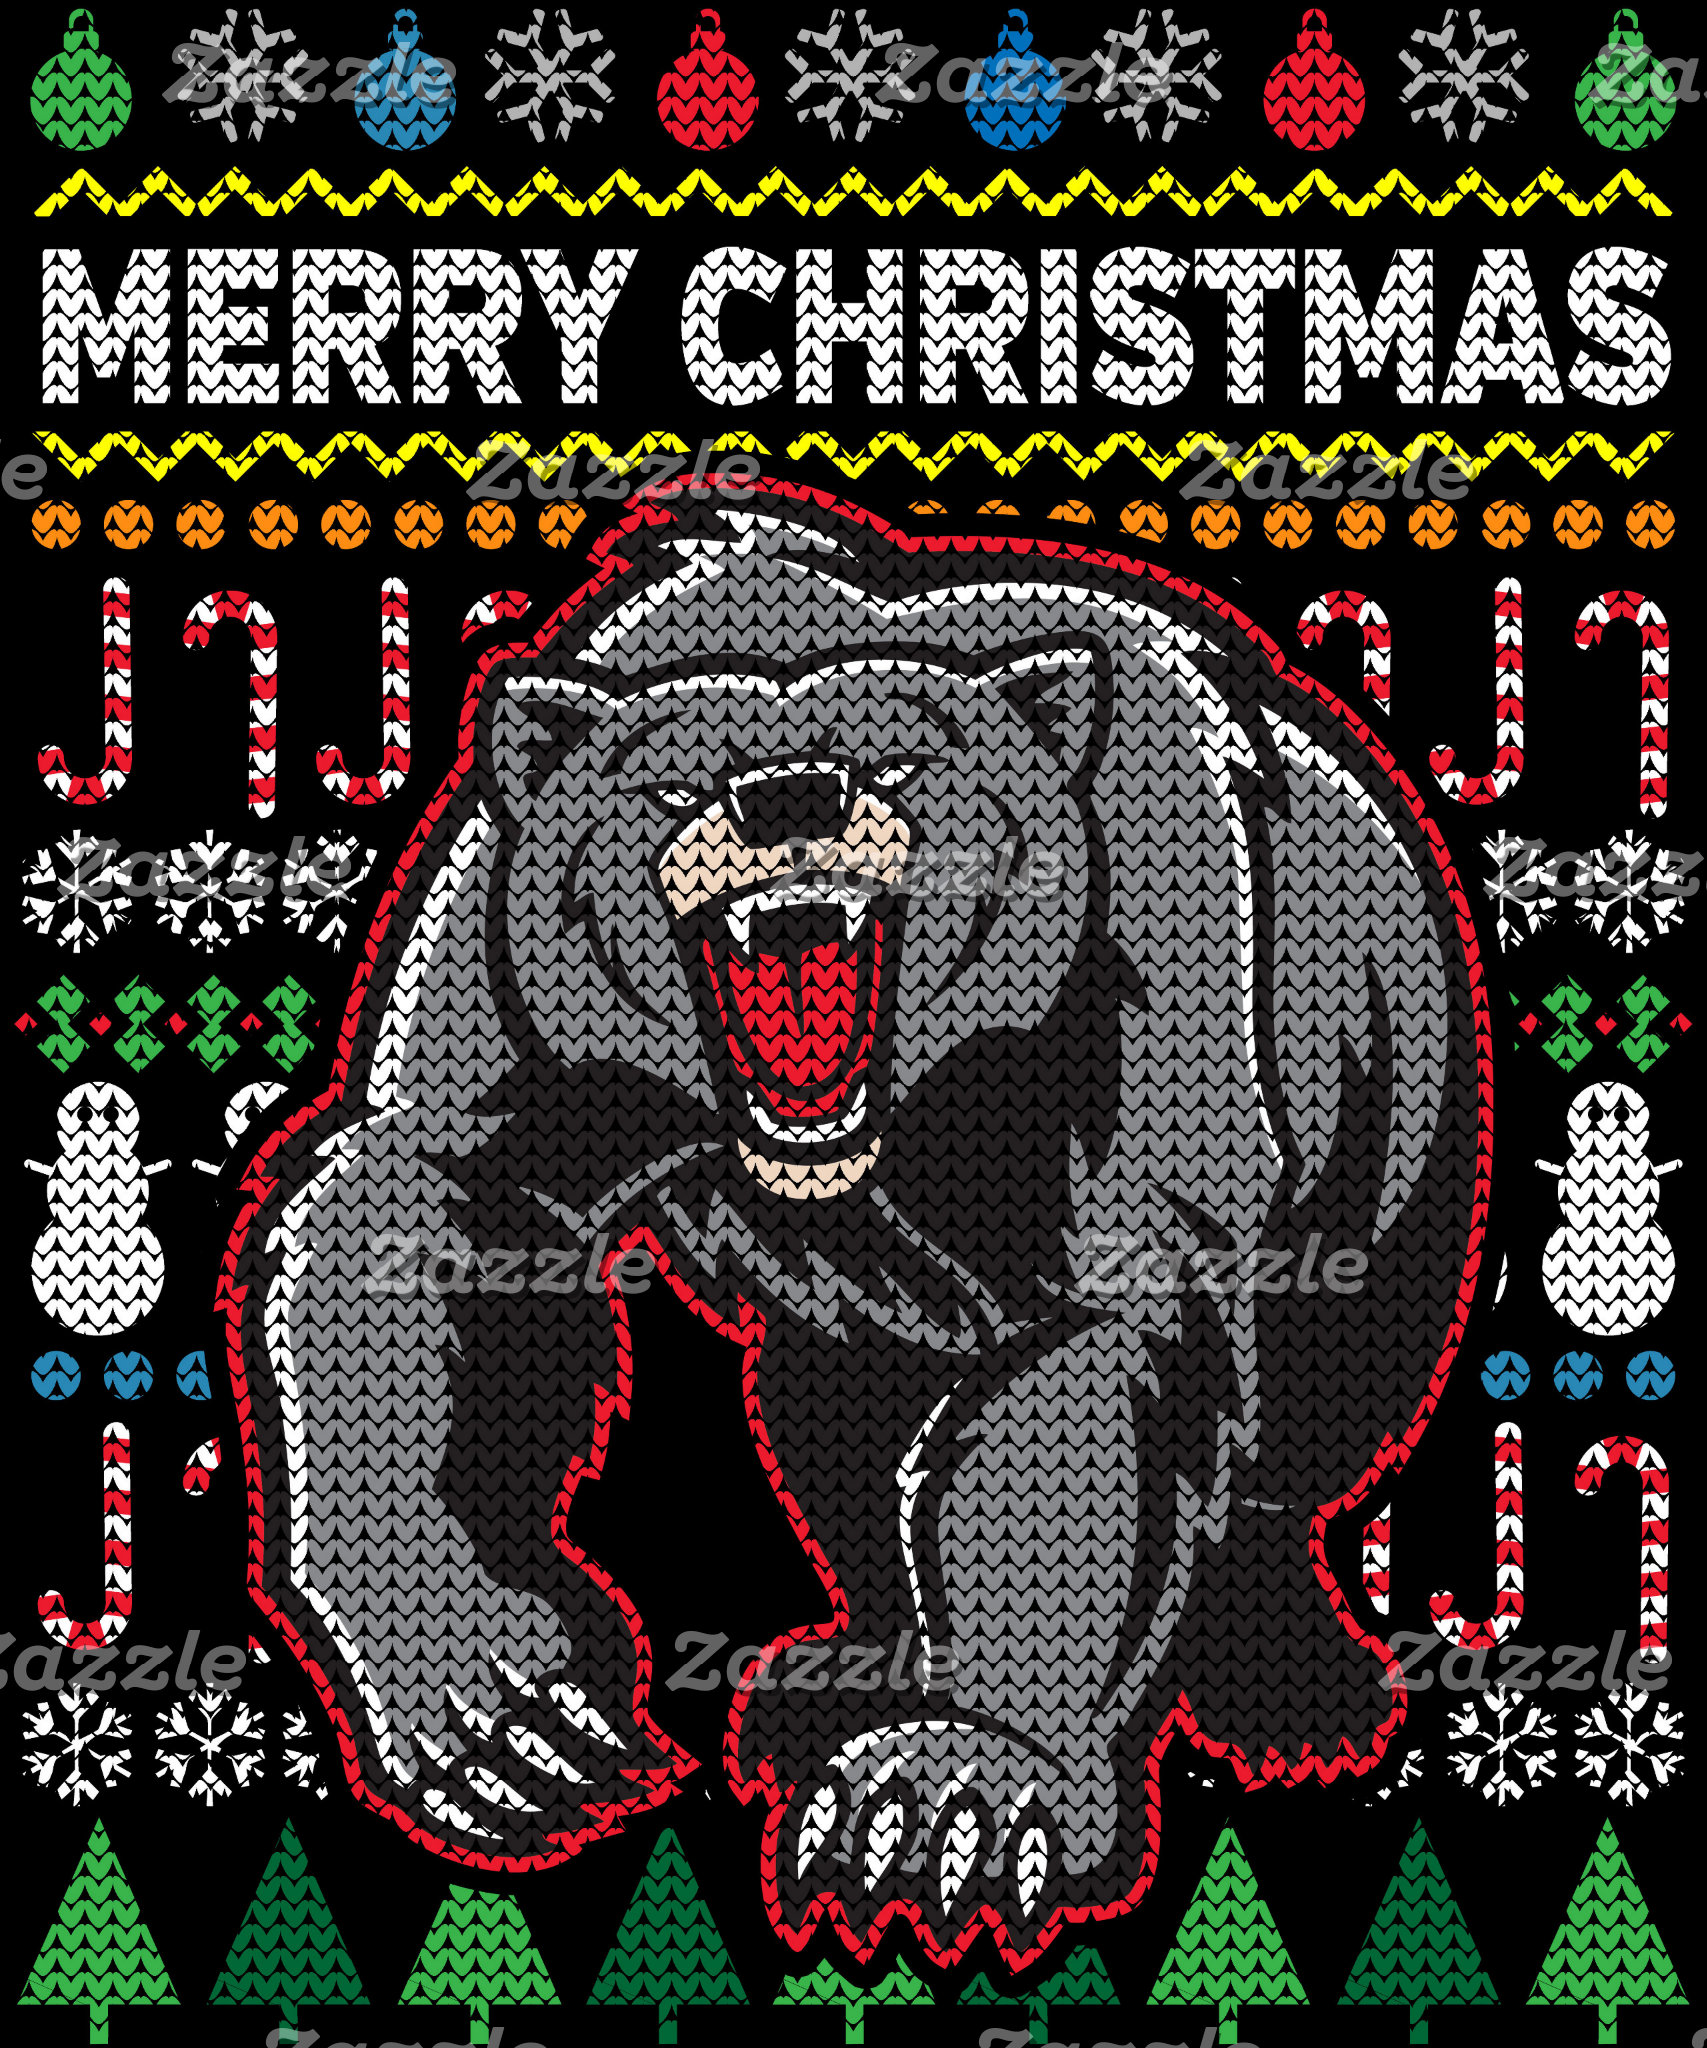 Bear Ugly Christmas Sweater